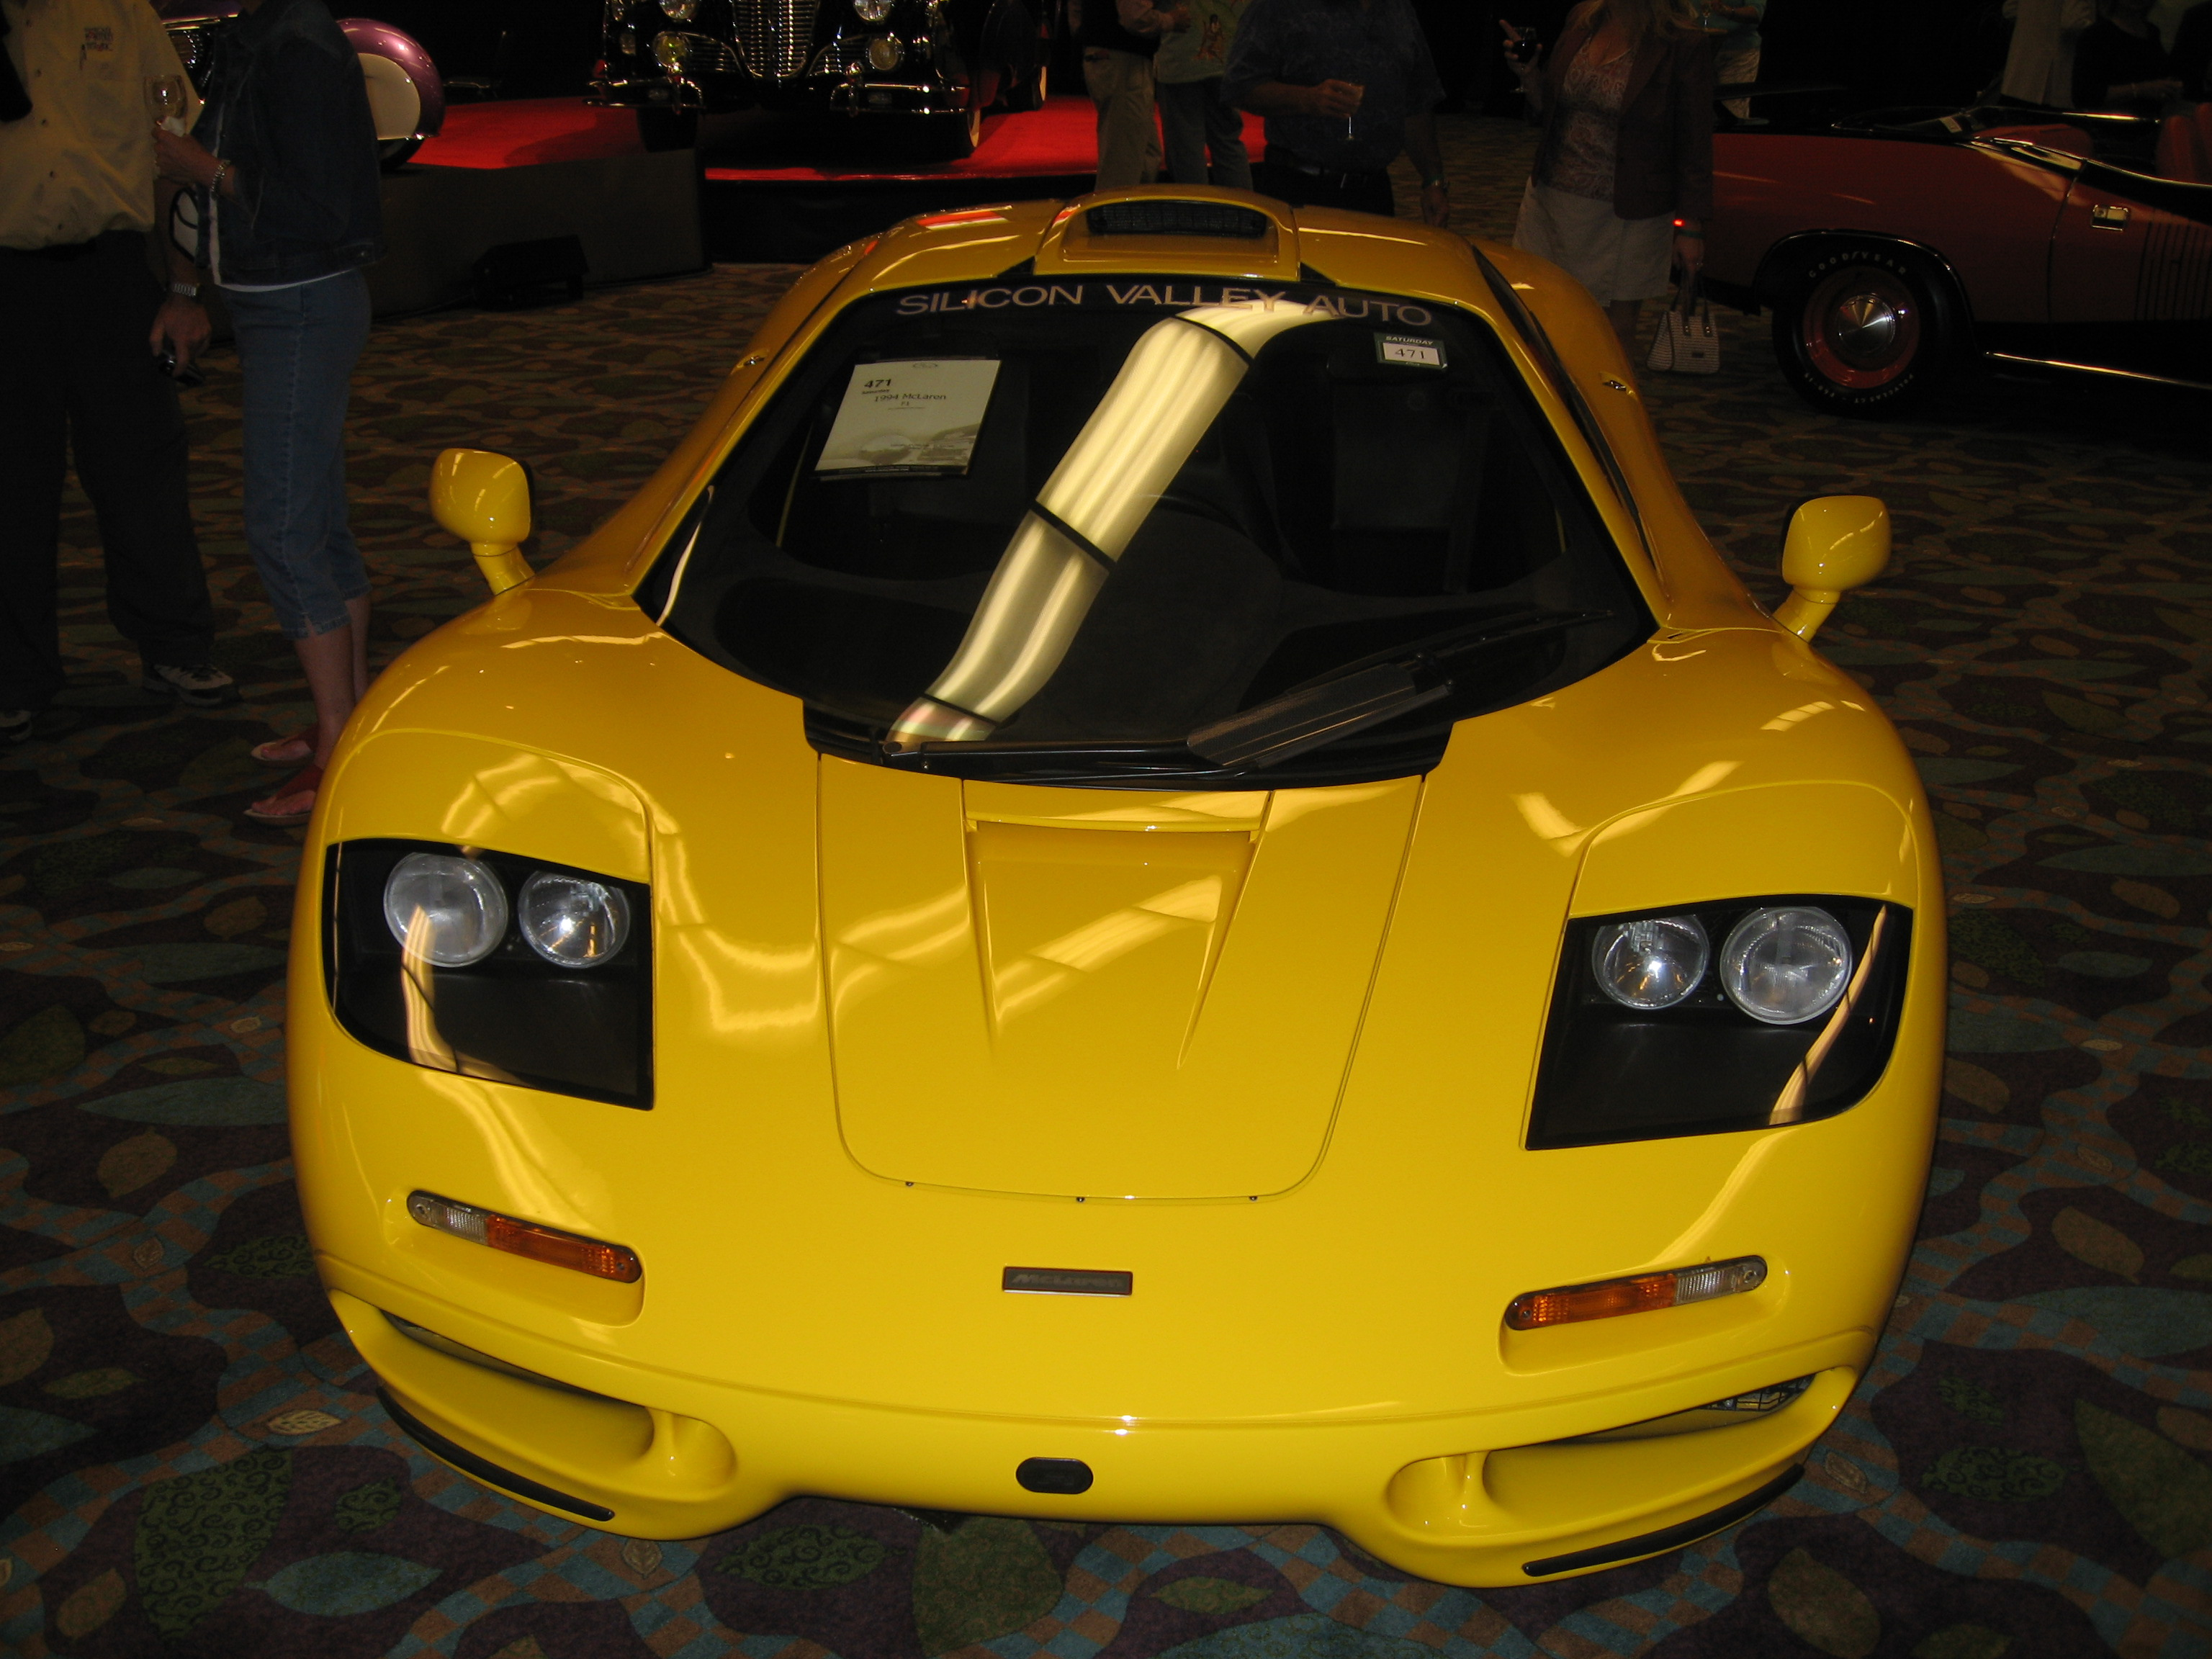 File:Yellow McLaren F1 2.jpg - Wikimedia Commons